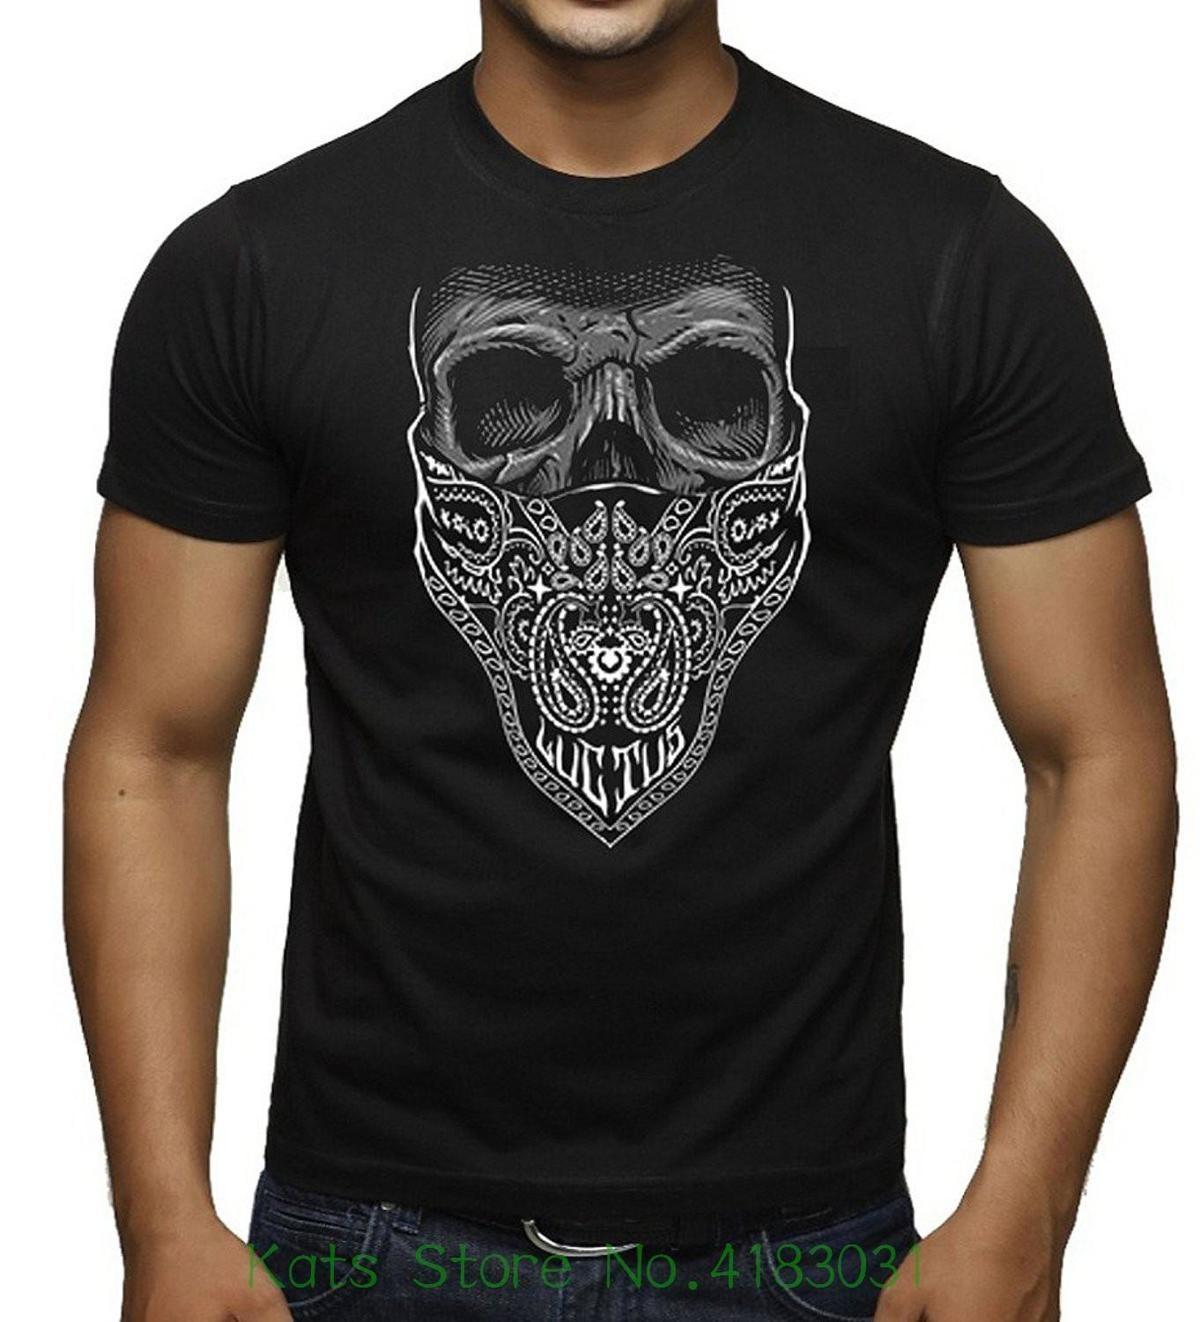 4ac1fc0de8d Men S White Bandana Skull Black T Shirt Black Men T Shirt Print Cotton  Short Sleeve Tee Shirt Site Online Buy T Shirt From Lijian047